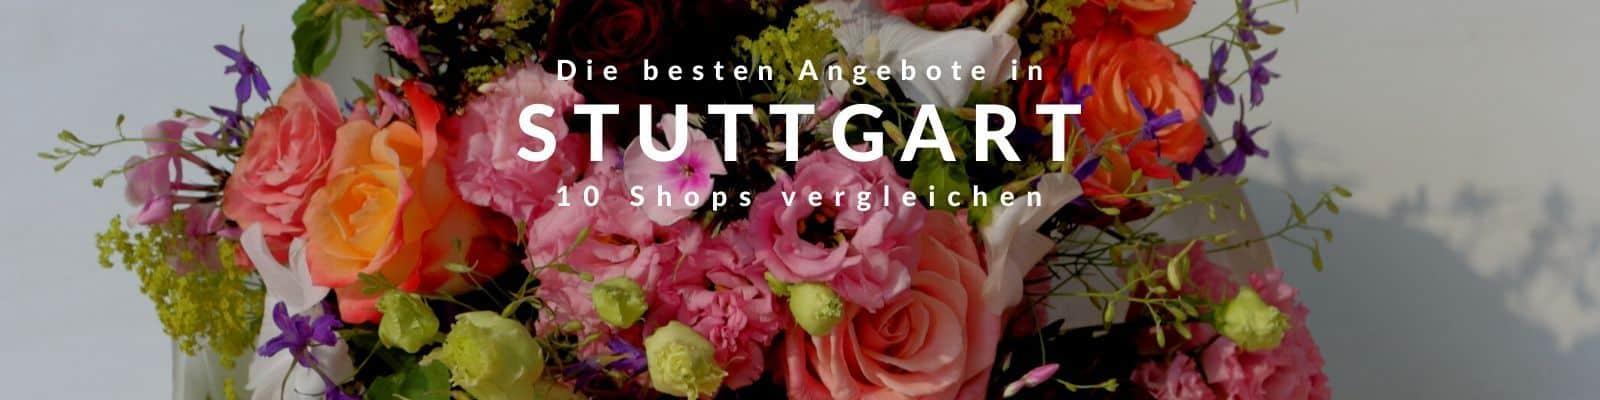 Blumen verschicken Stuttgart - FLEUROP